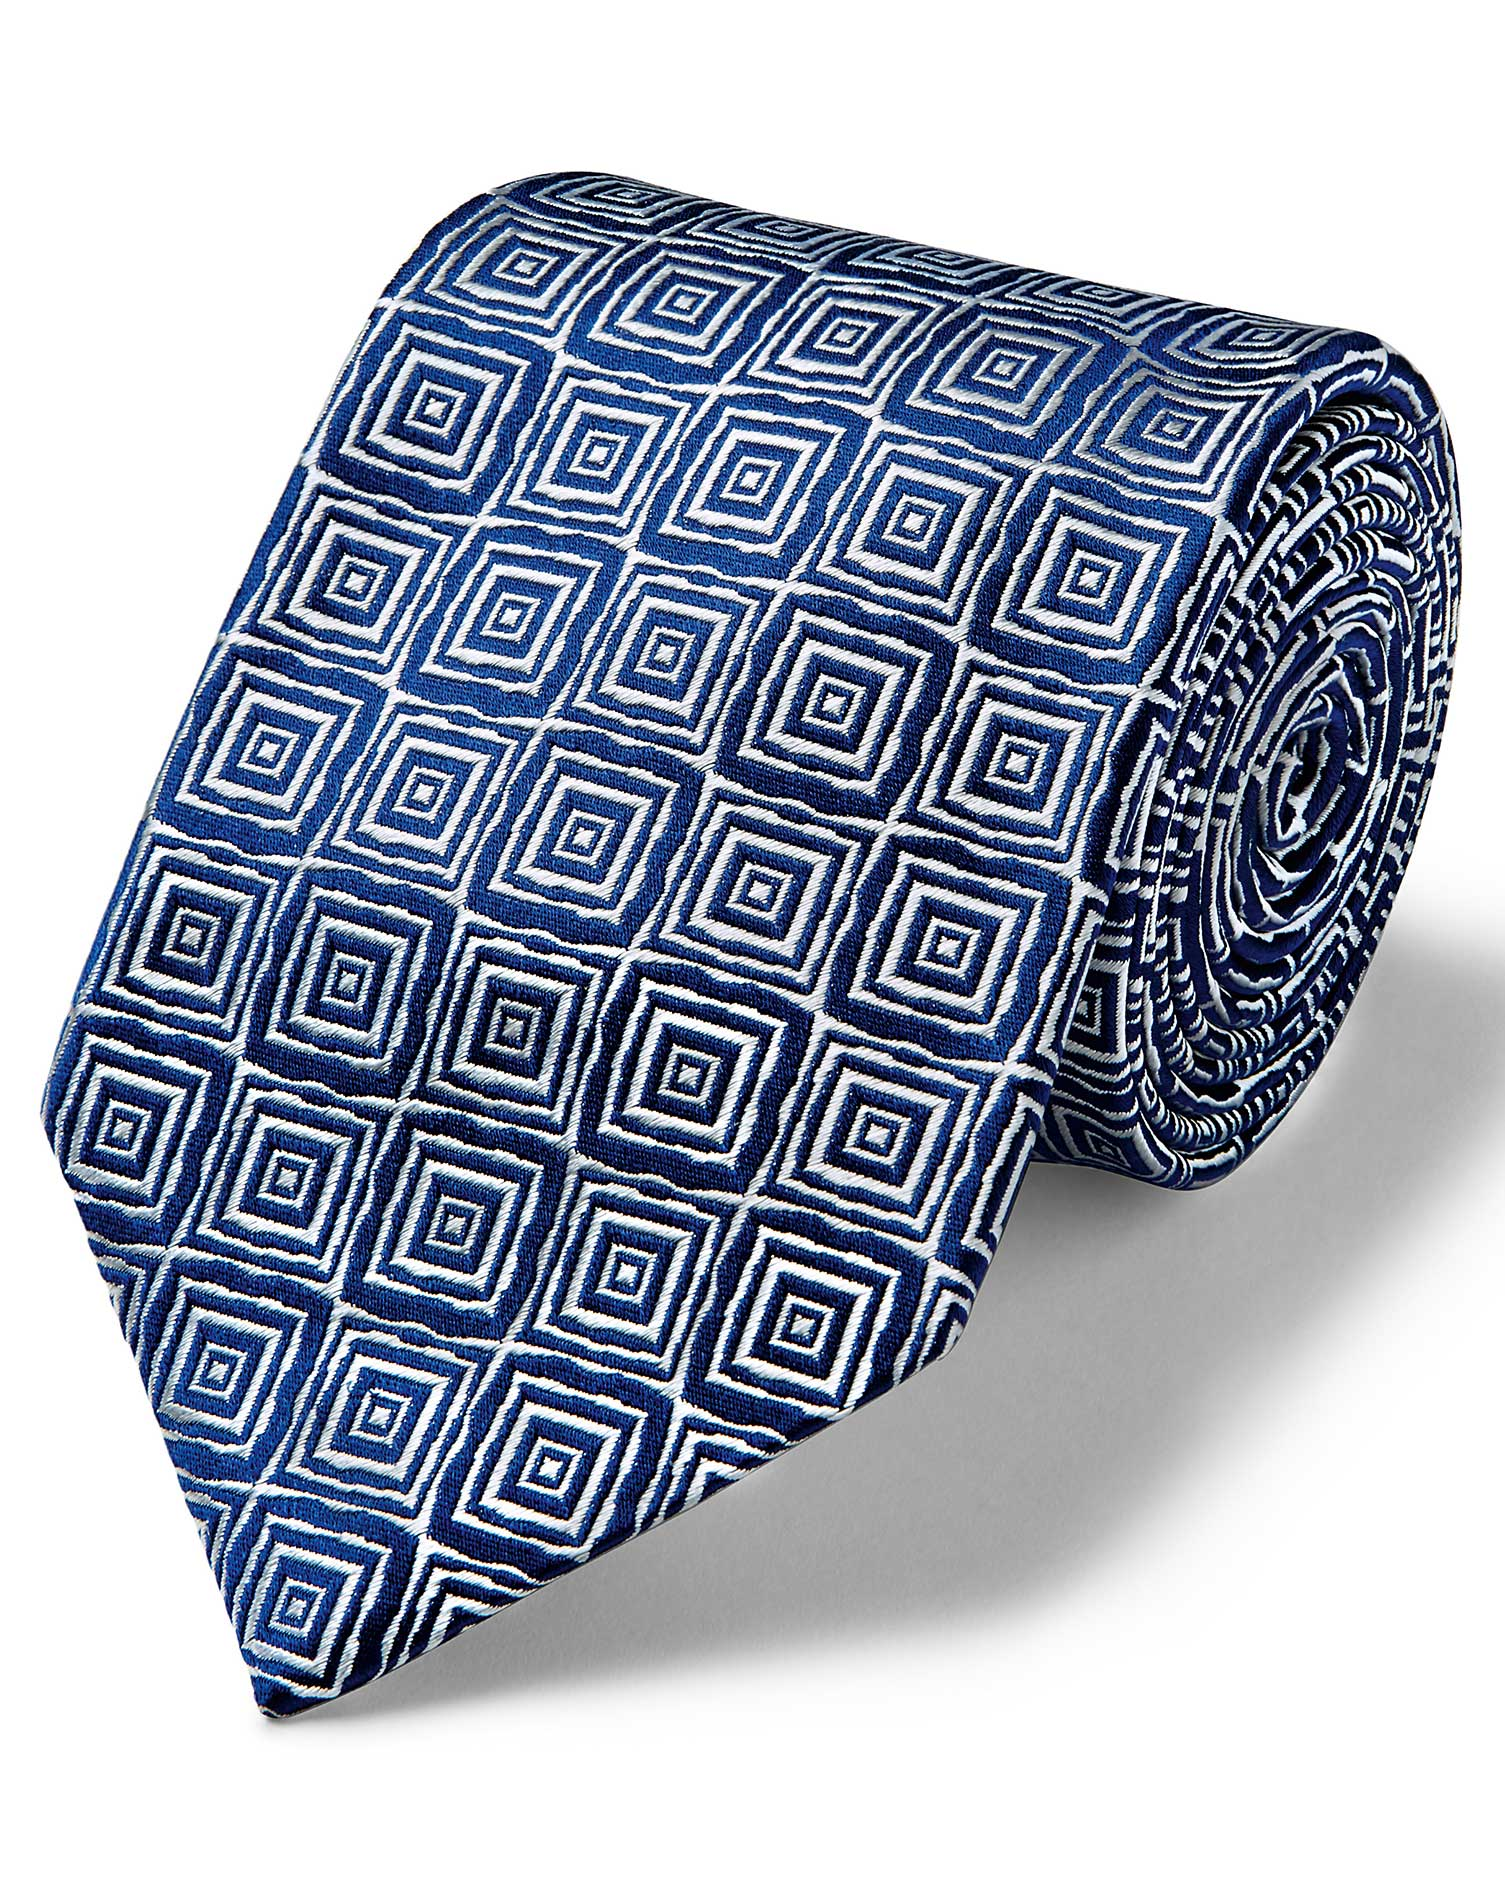 Silk Silver And Navy Square Geometric English Luxury Tie